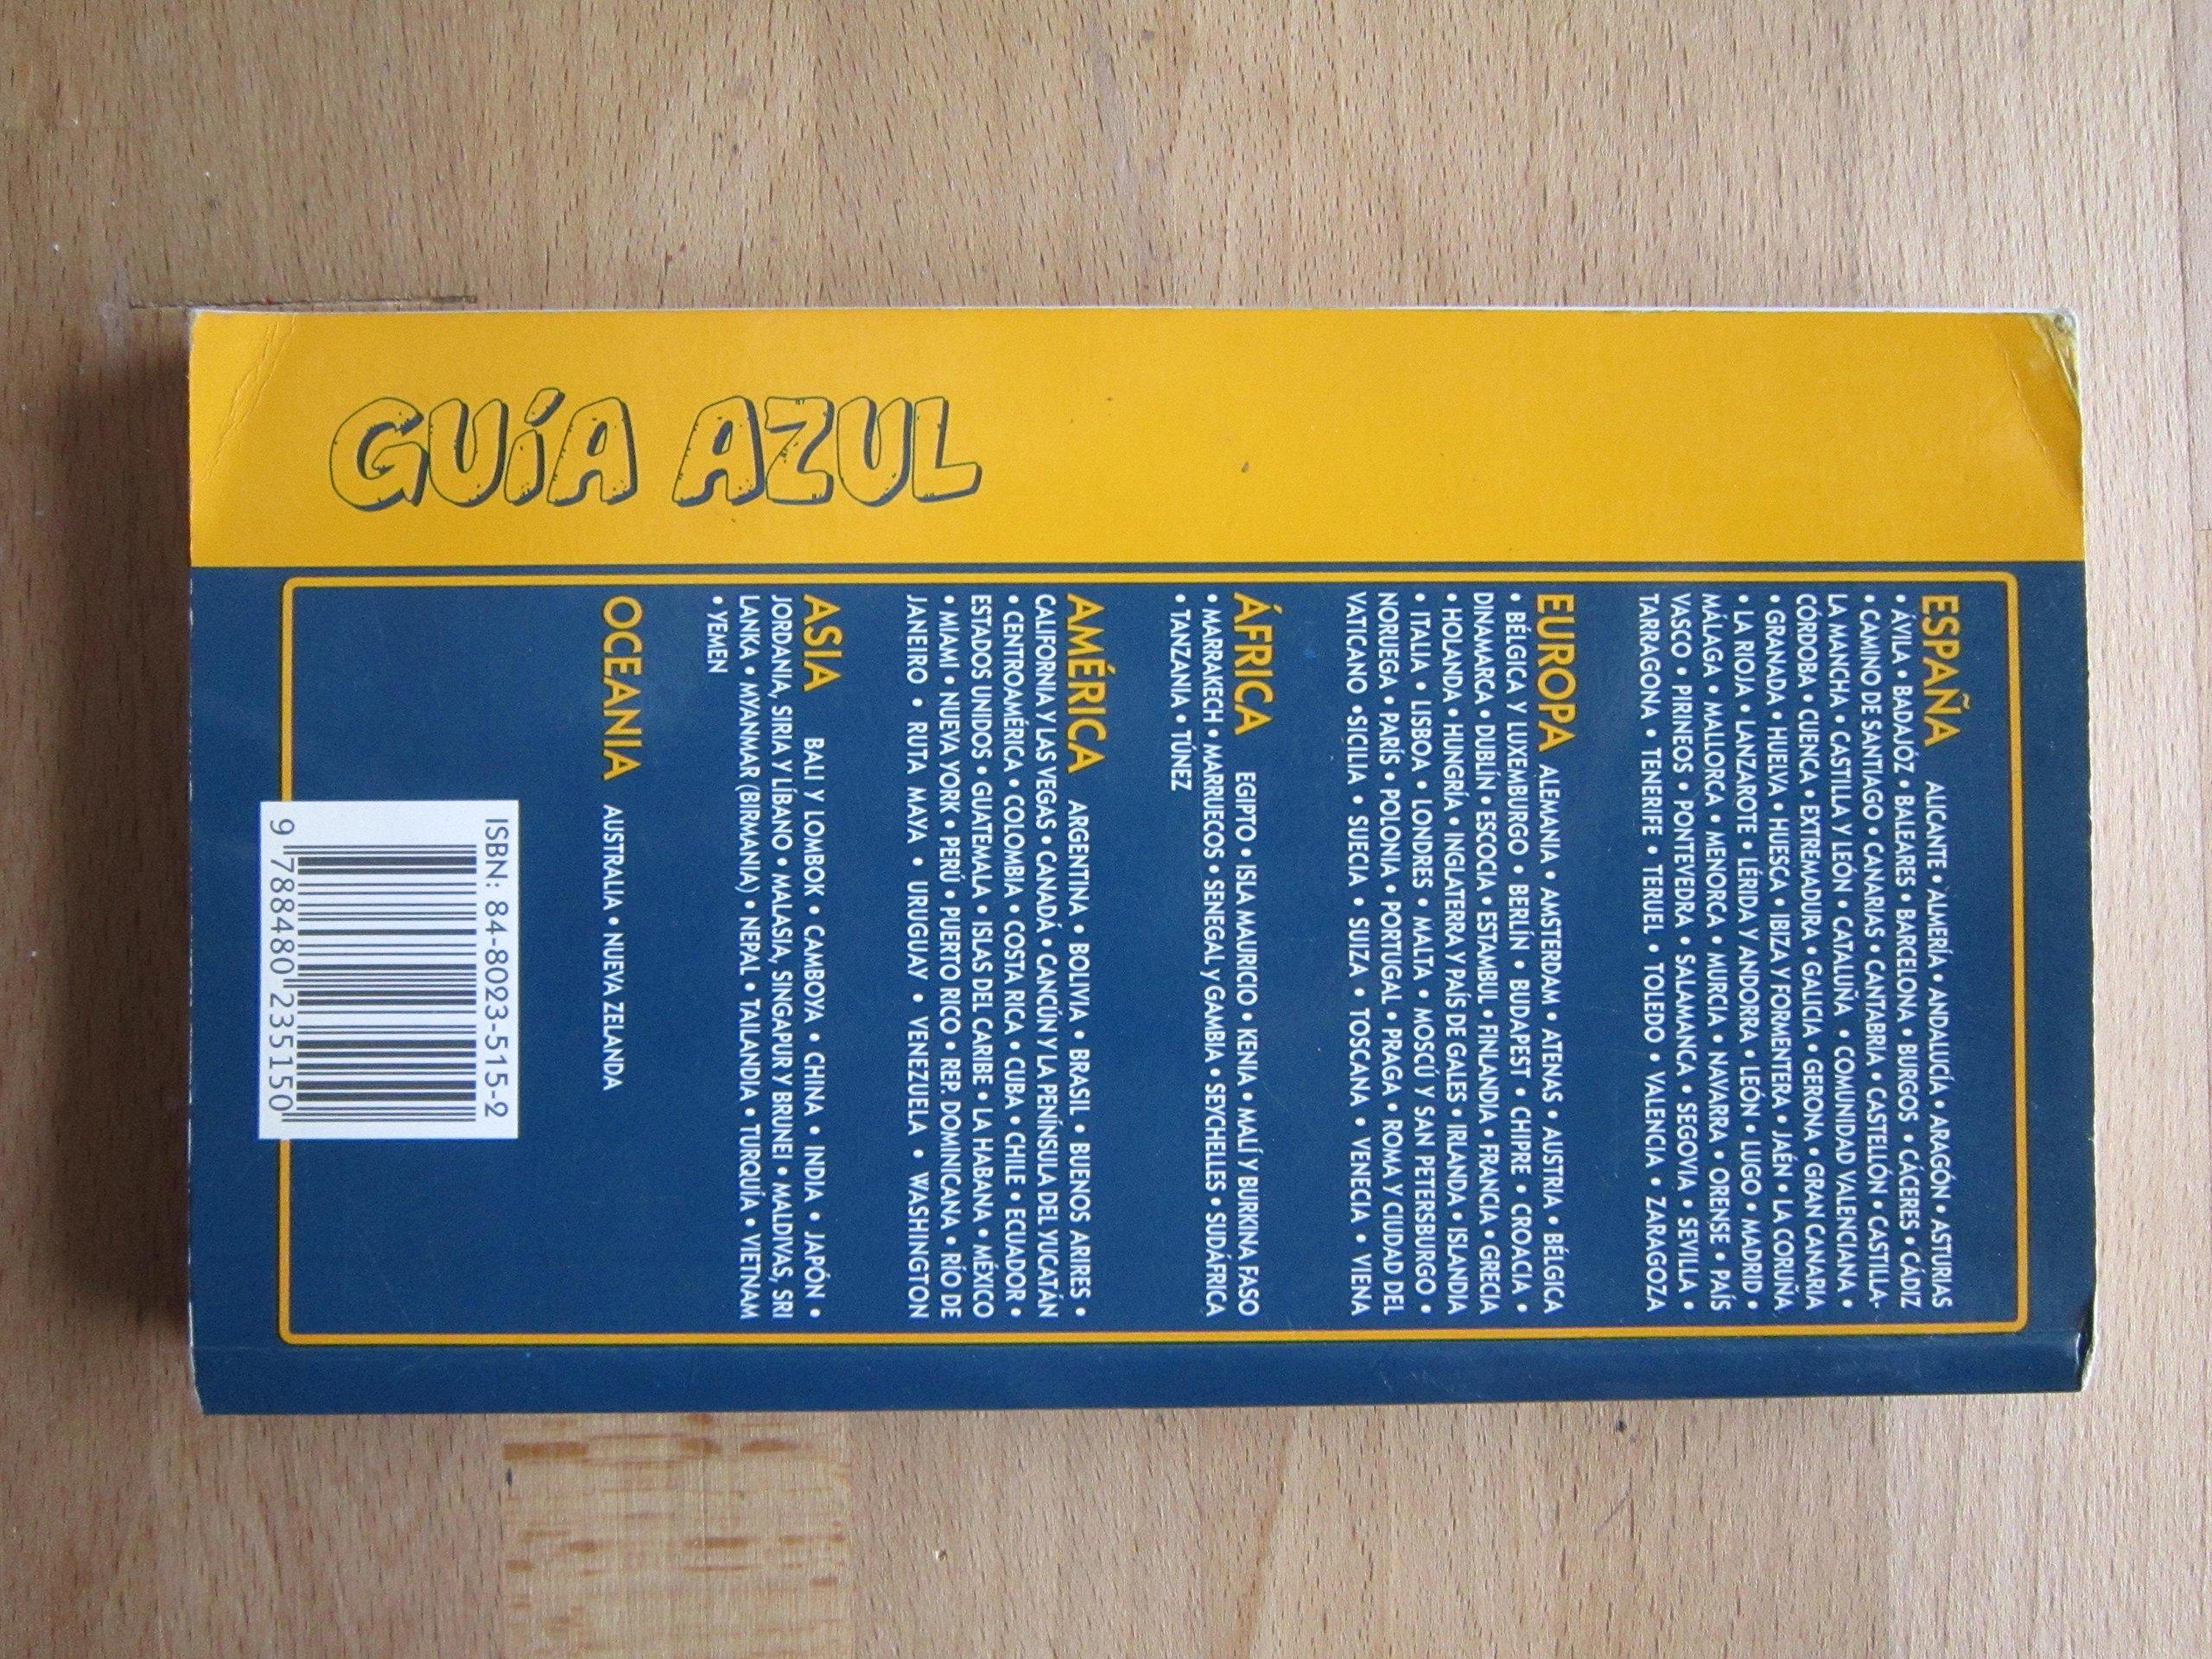 Viena/ Venice (Iudades Y Paises Del Mundo) (Spanish Edition): 9788480235150: Amazon.com: Books